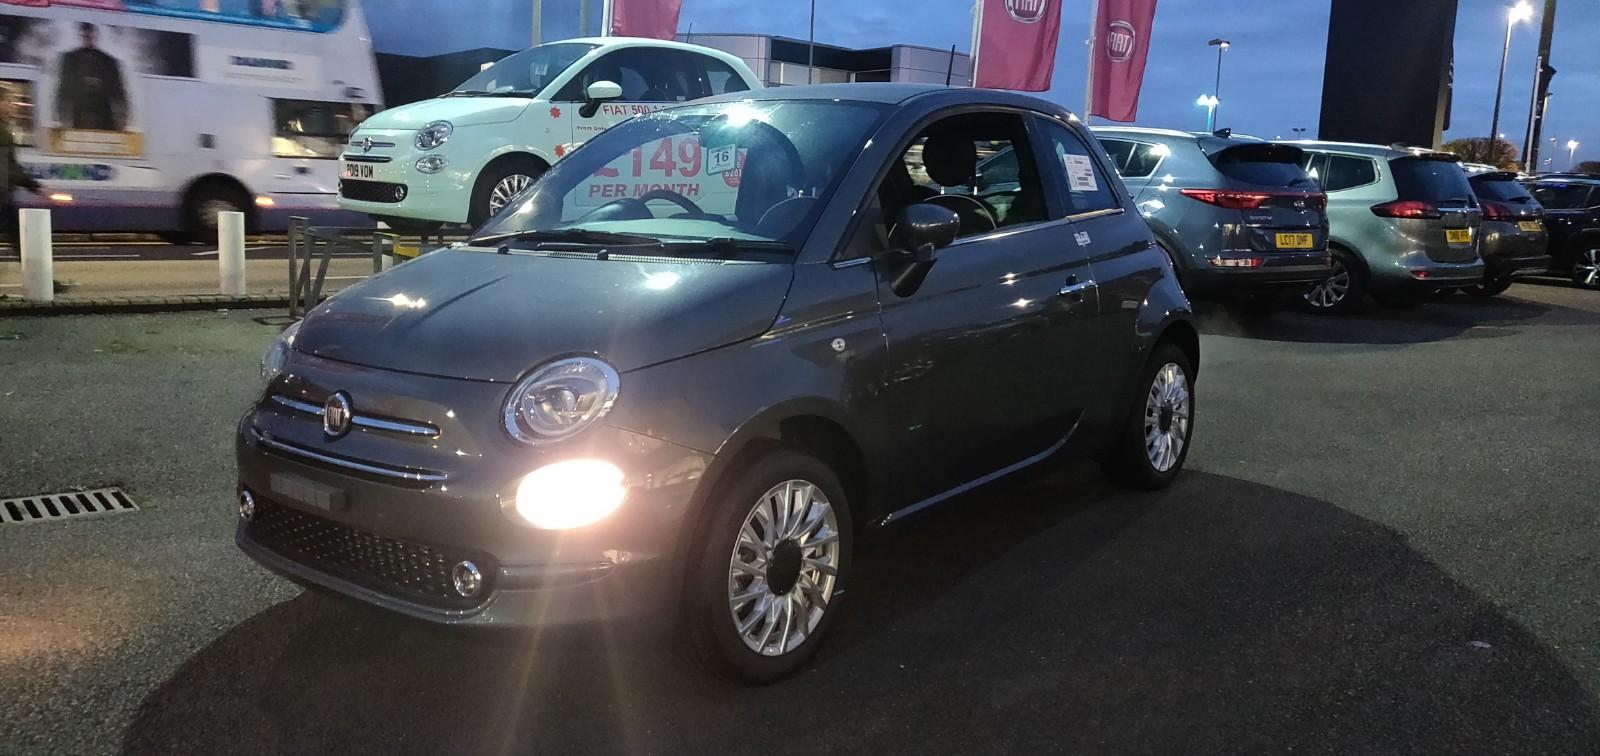 Fiat 500 1.2 Lounge 3dr image 10